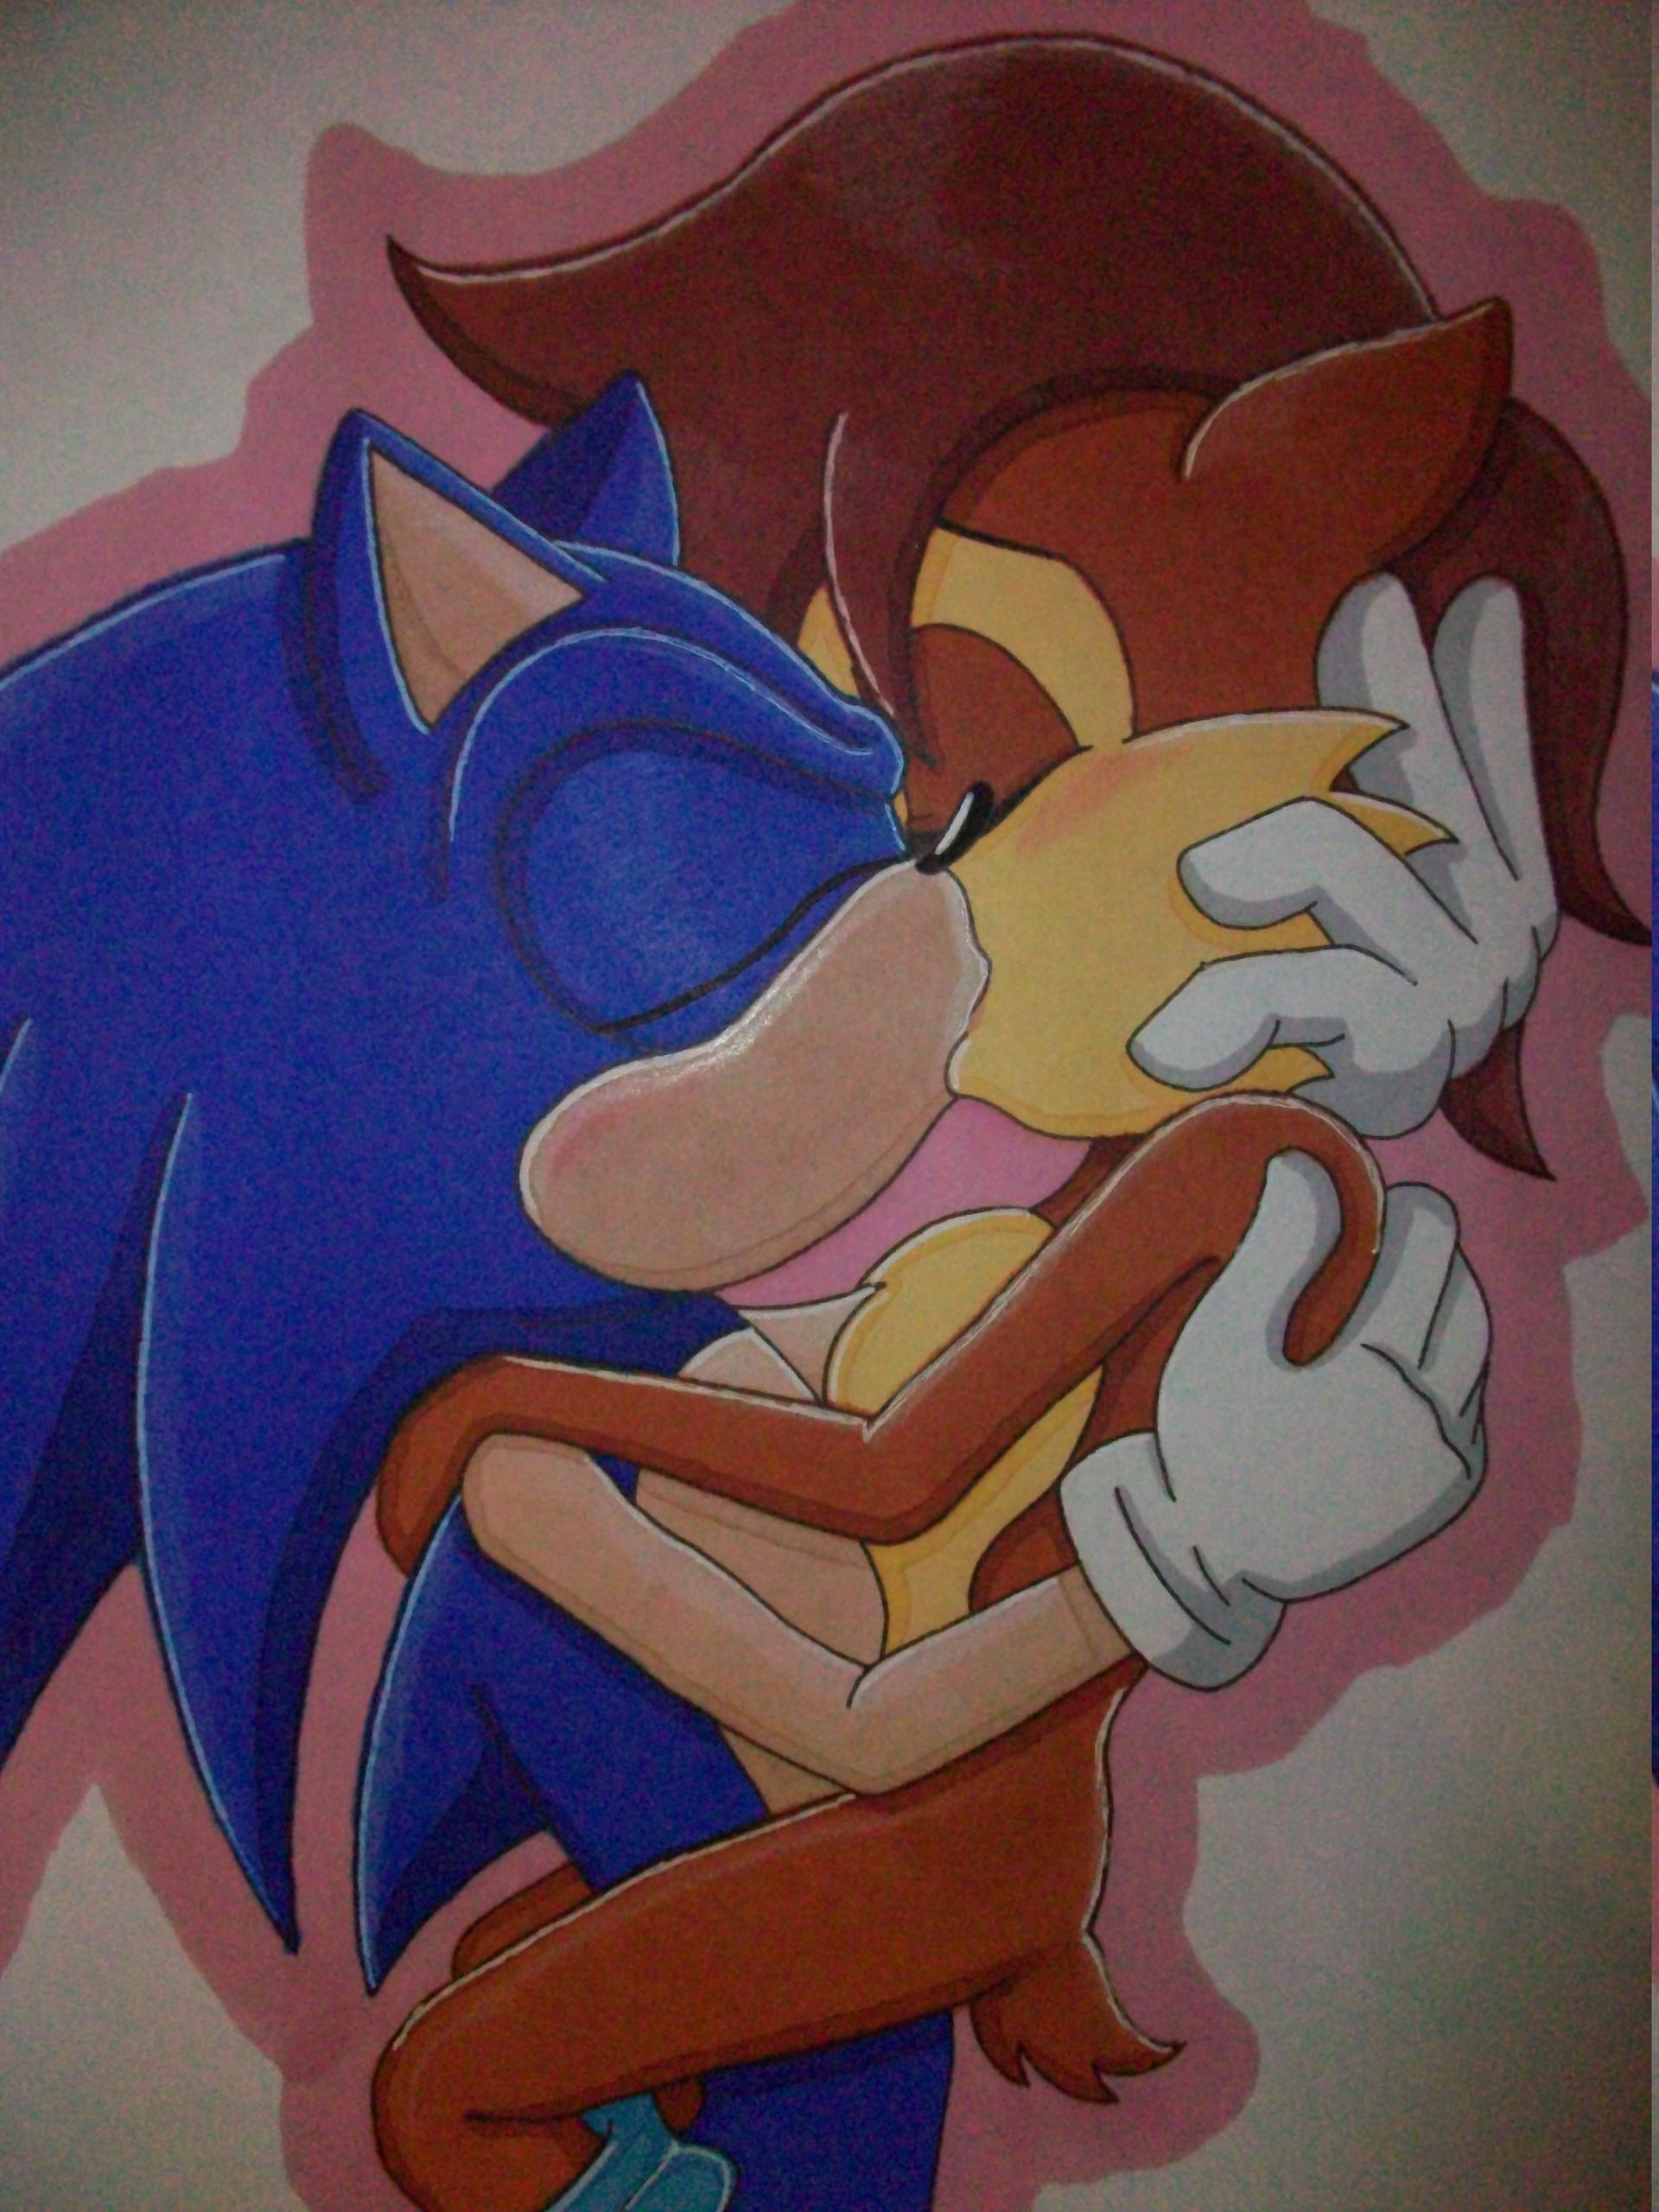 Sonic shina fuck pics porn movie